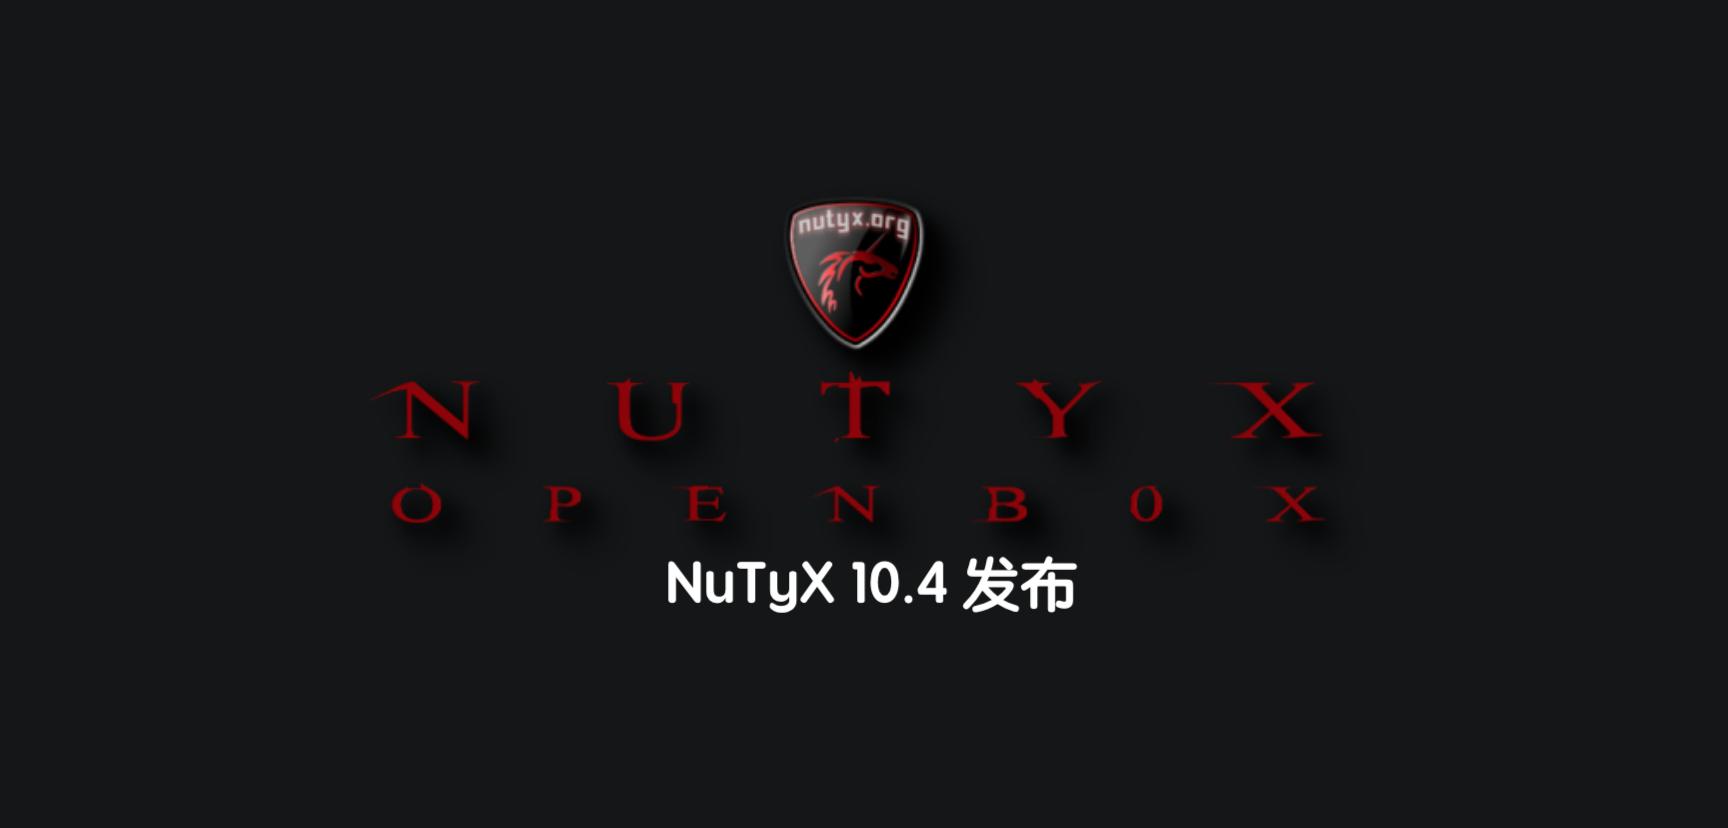 Linux发行版 NuTyX 10.4 发布